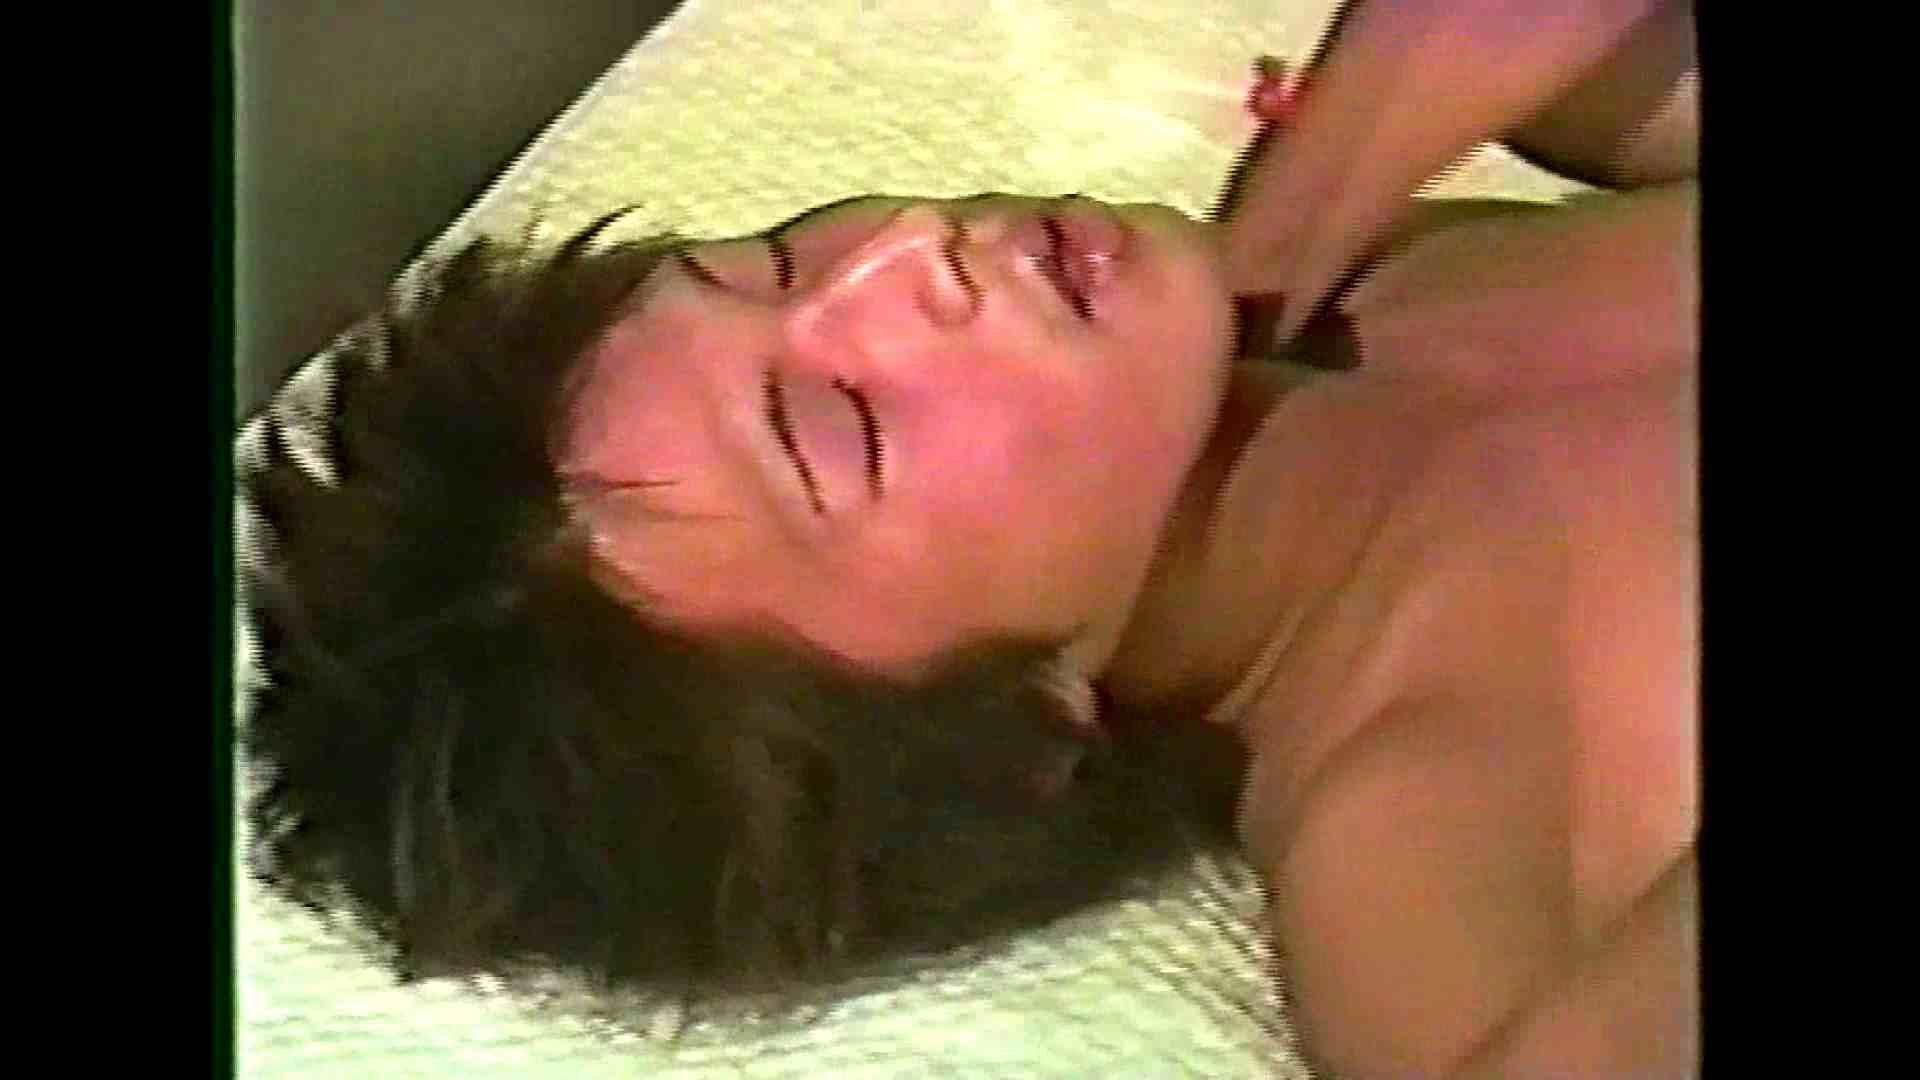 MADOKAさんのズリネタコレクションVol.3-2 入浴・シャワー ゲイ精子画像 95連発 23